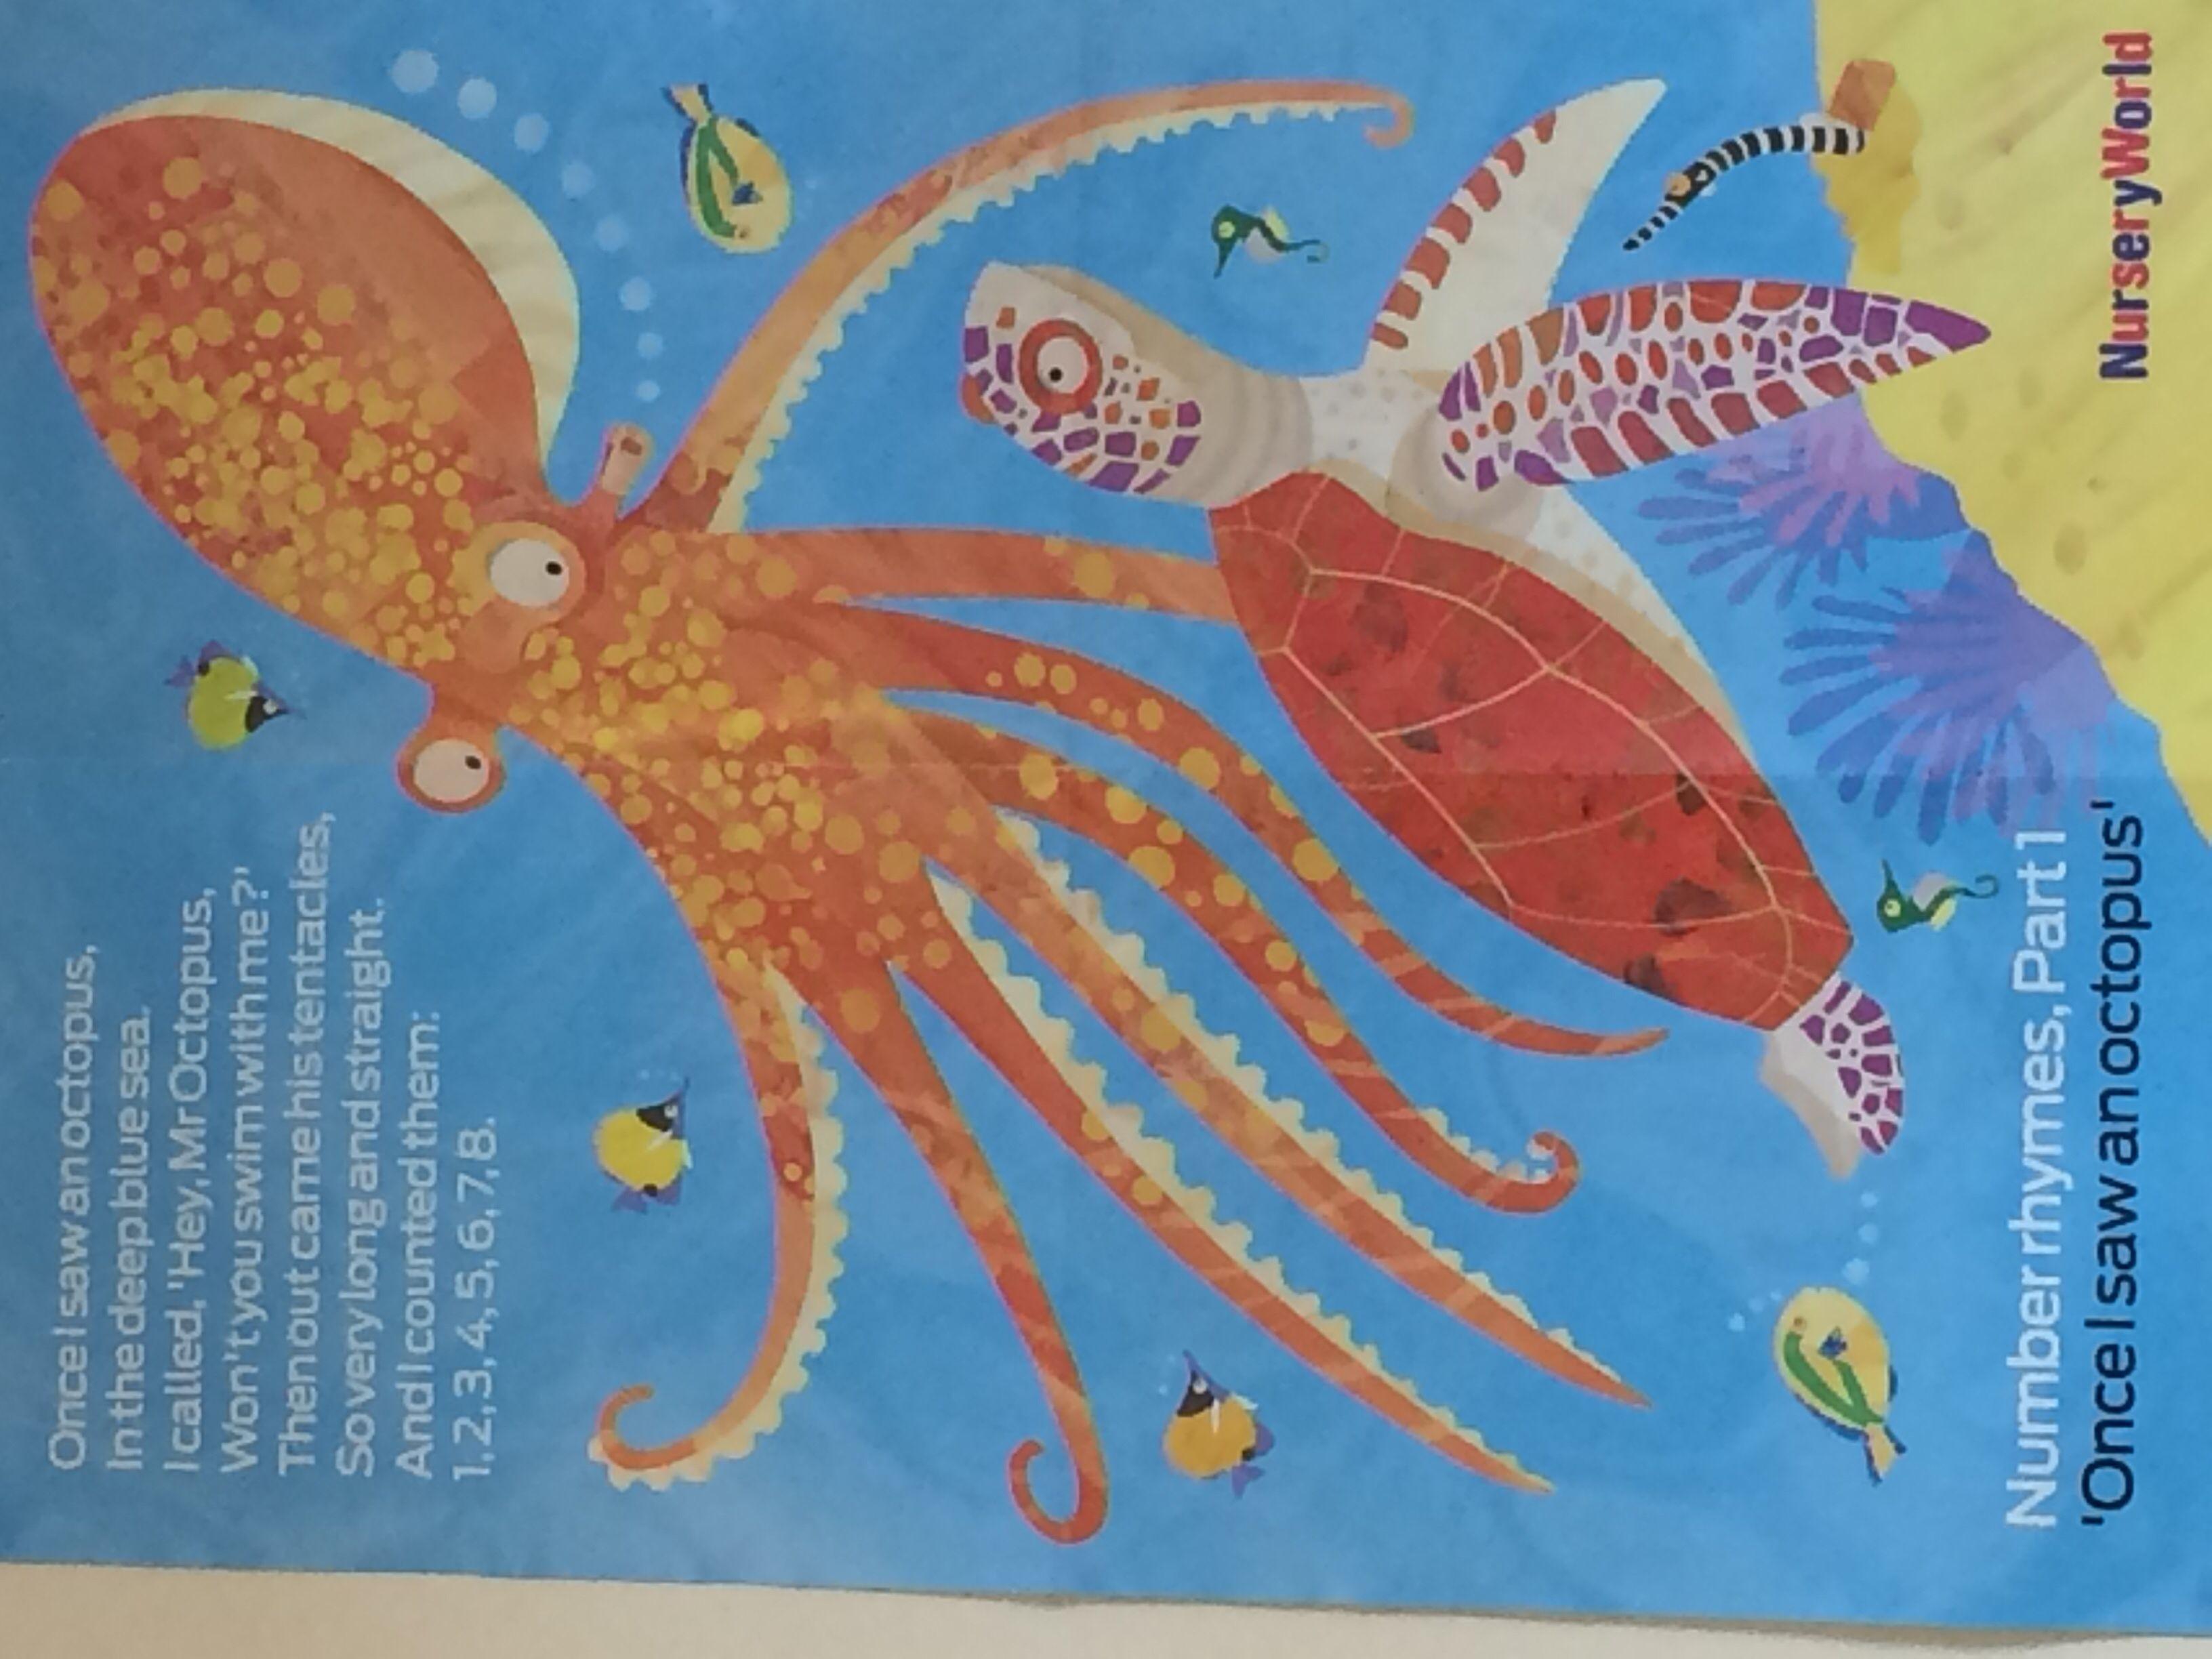 Octopus Papercraft Octopus Poem Ocean Pinterest